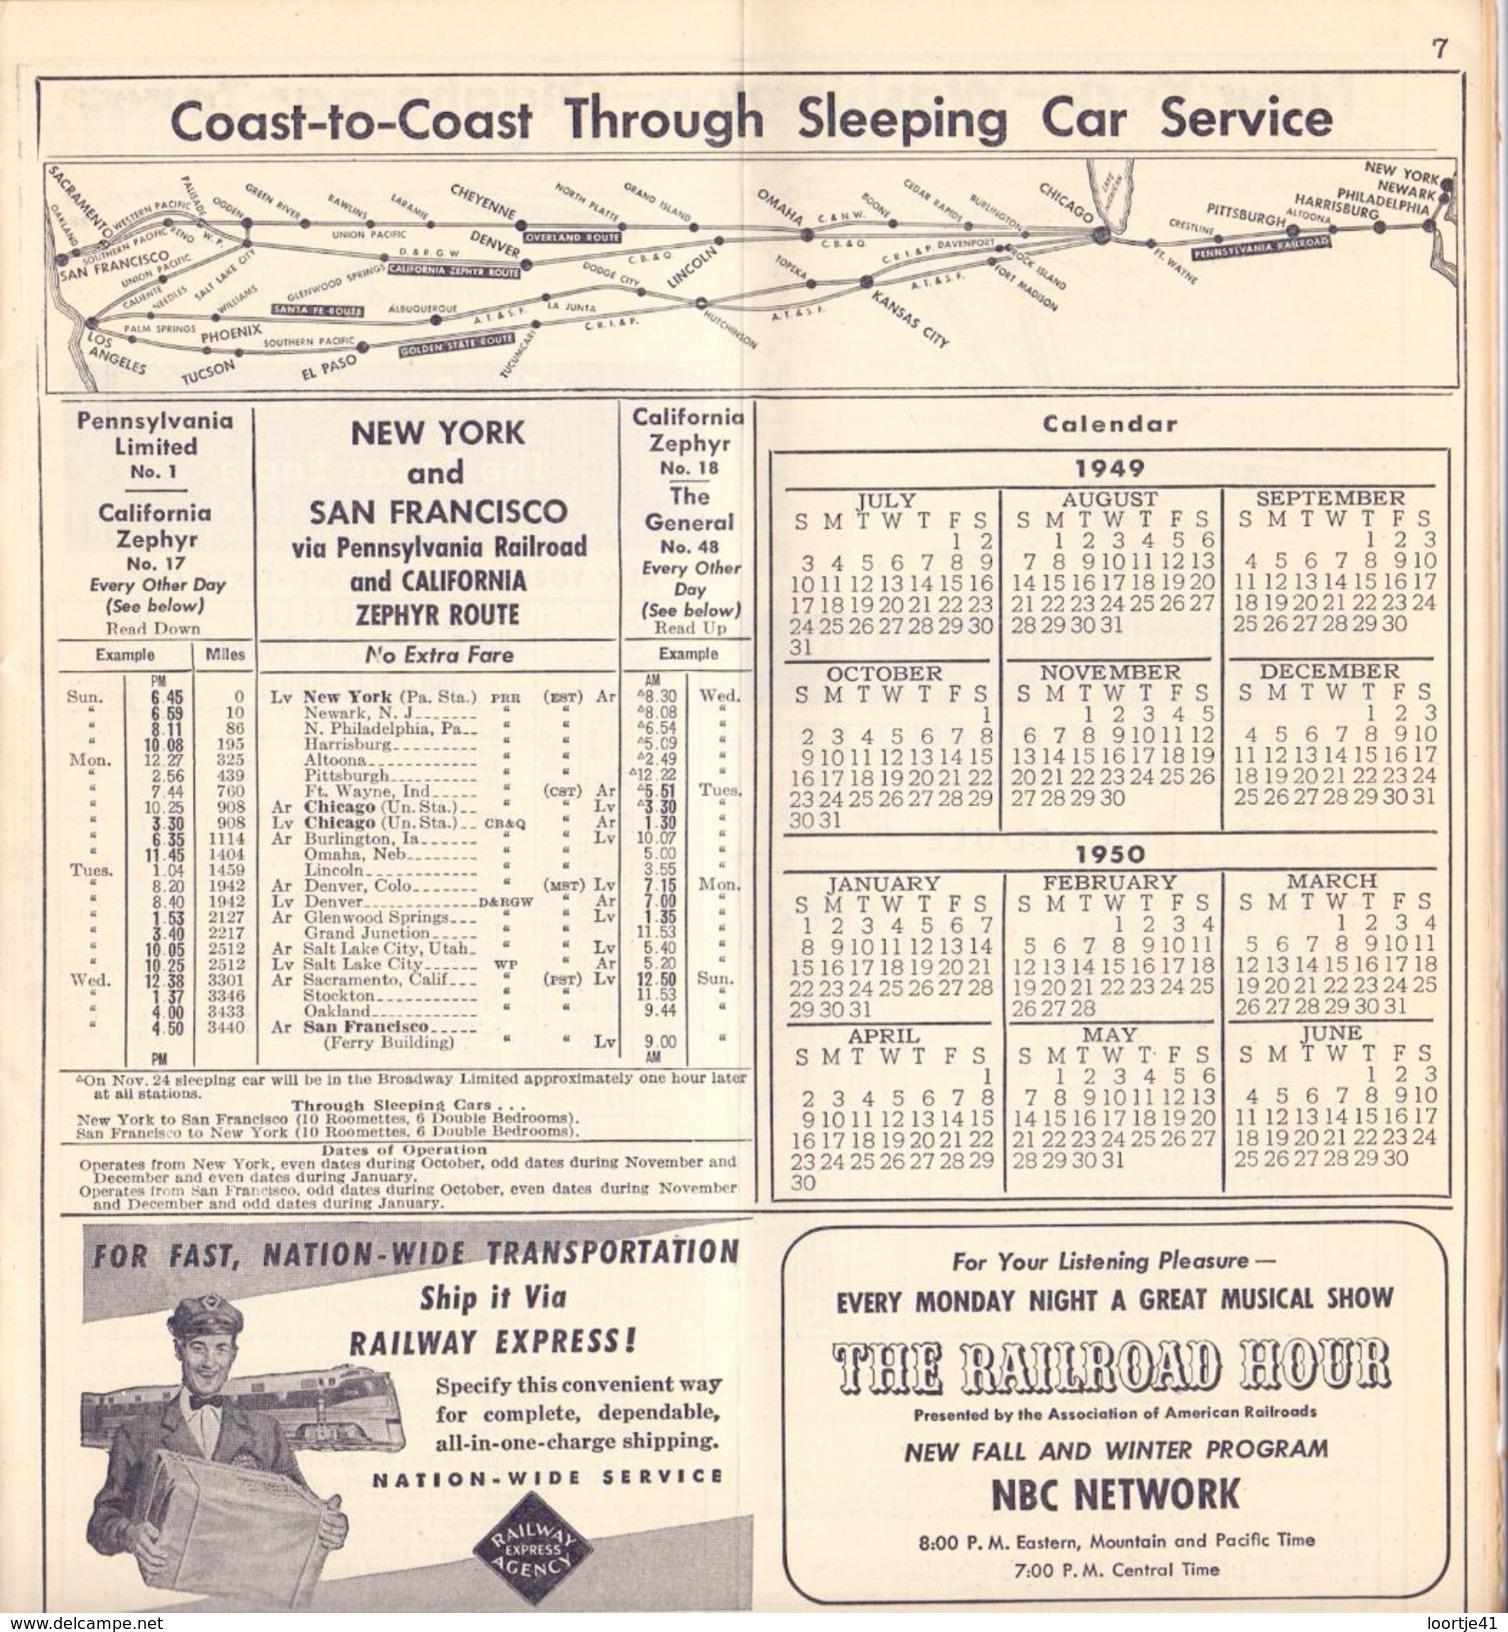 Tourisme - Timetables Schedules Dienstregeling  - Trains Treinen Pennsylvania Railroad Time Tables 1949 - World